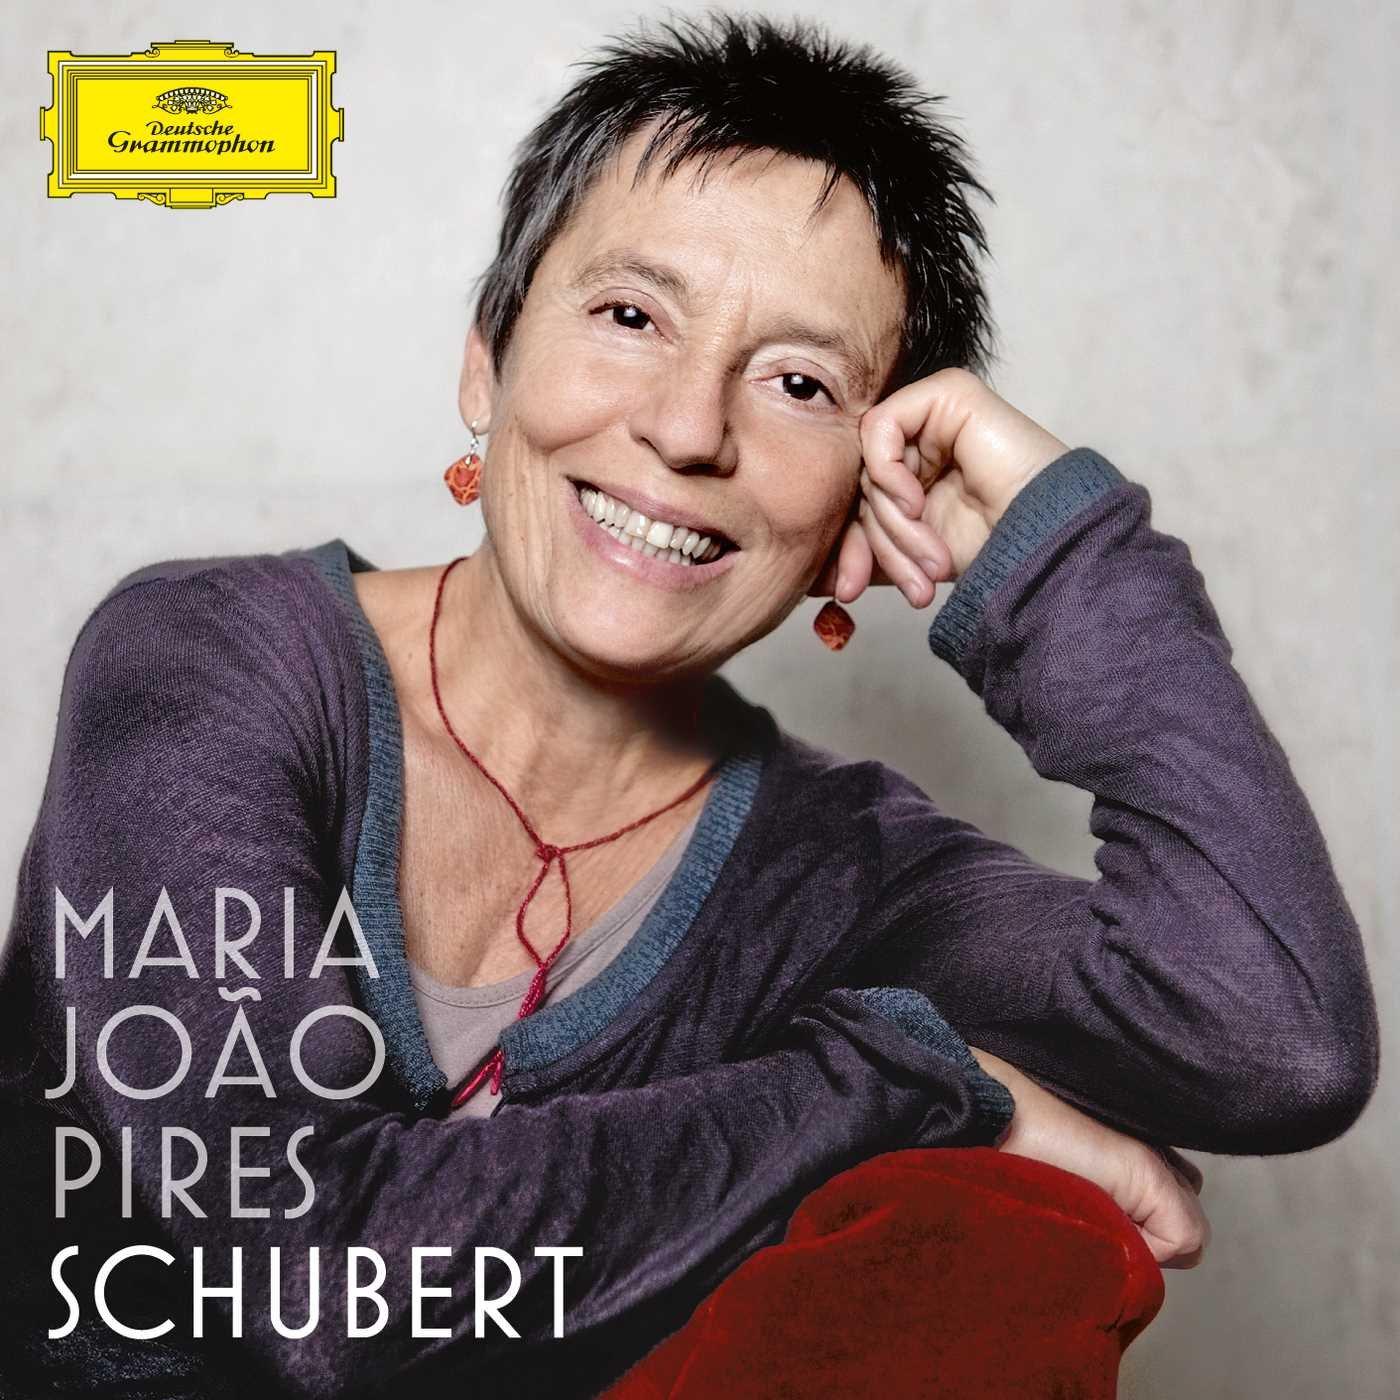 CD : Maria Joao Pires - Schubert: Piano Sonatas D845 & D960 (CD)